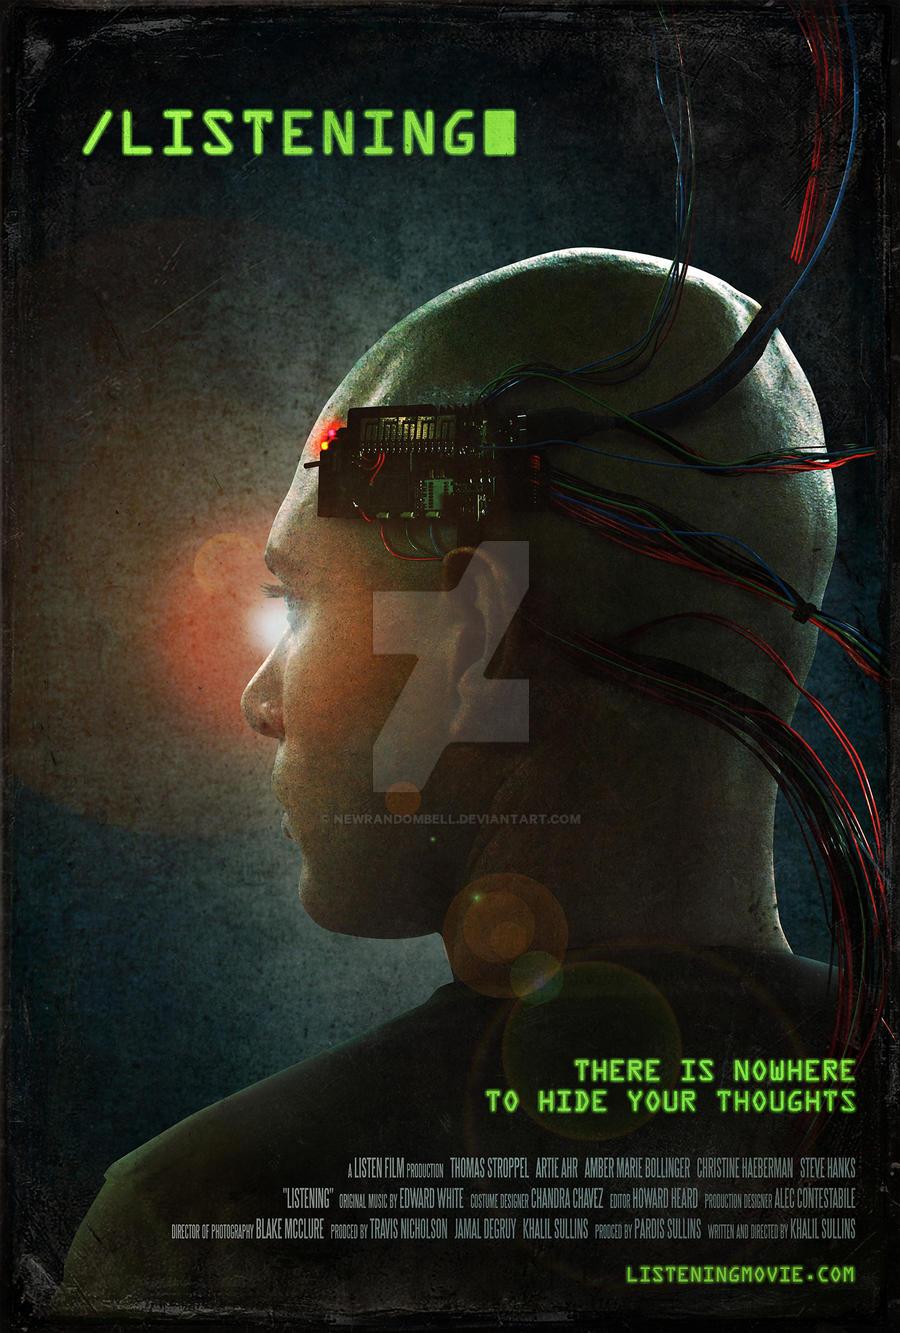 Listening - Theatrical Movie Poster by NewRandombell on DeviantArt